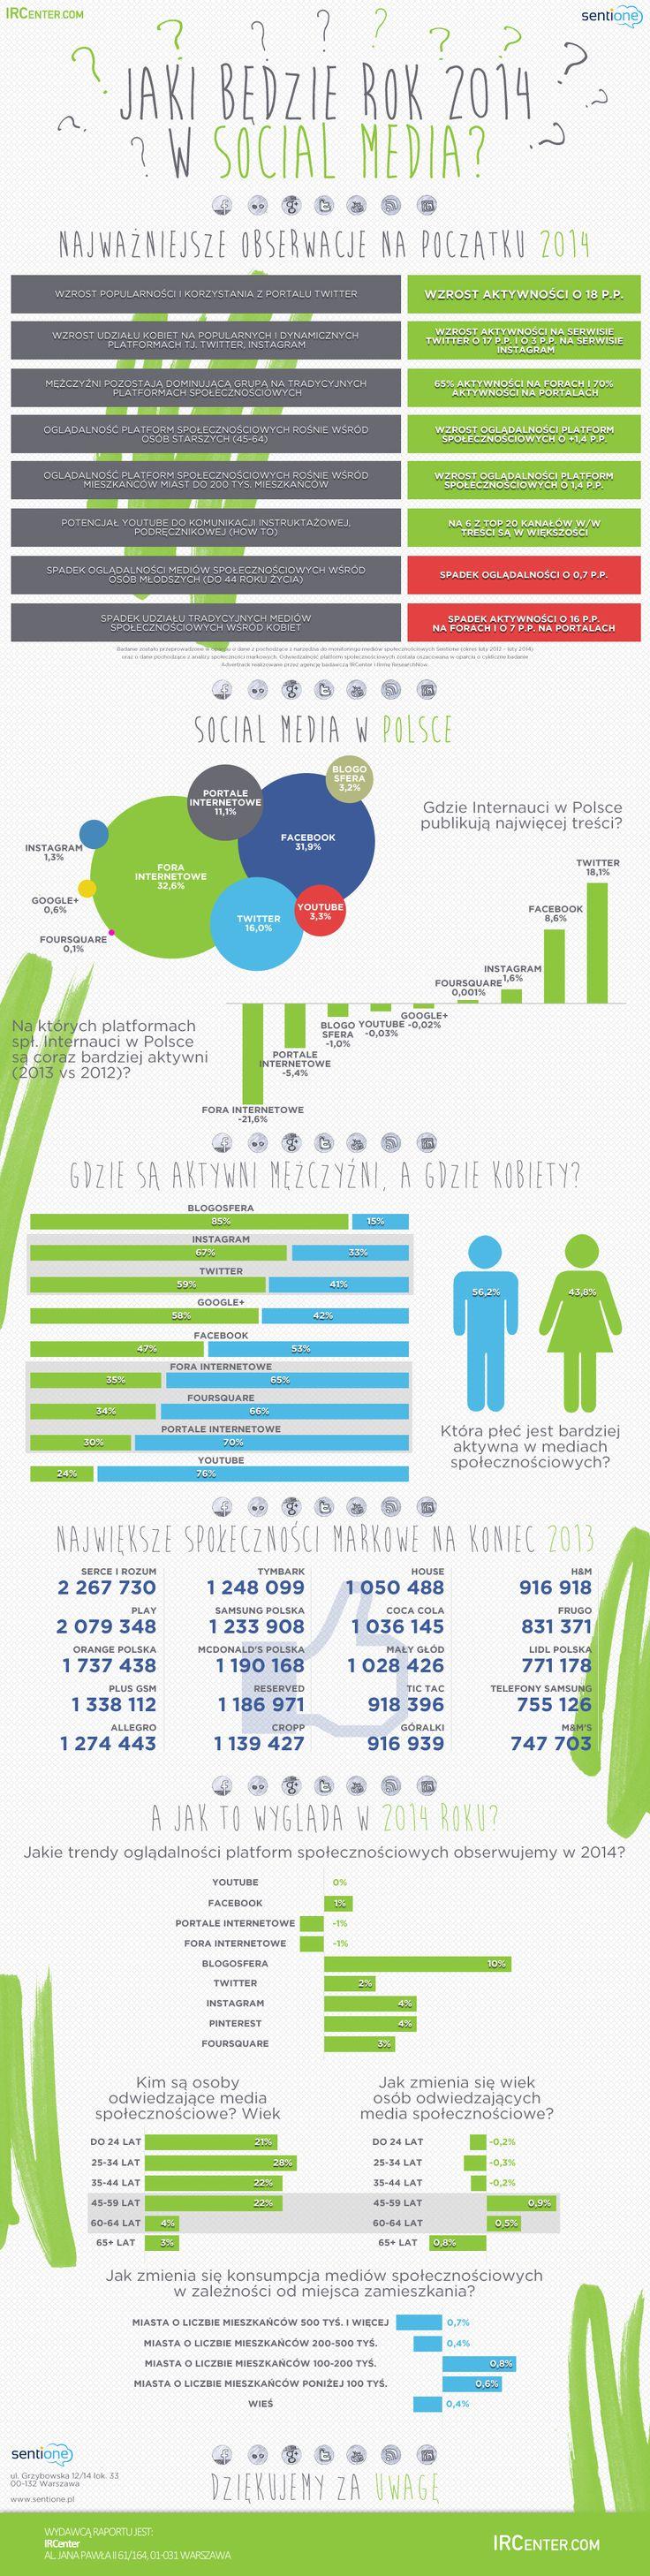 Rok 2014 w Social Media - raport